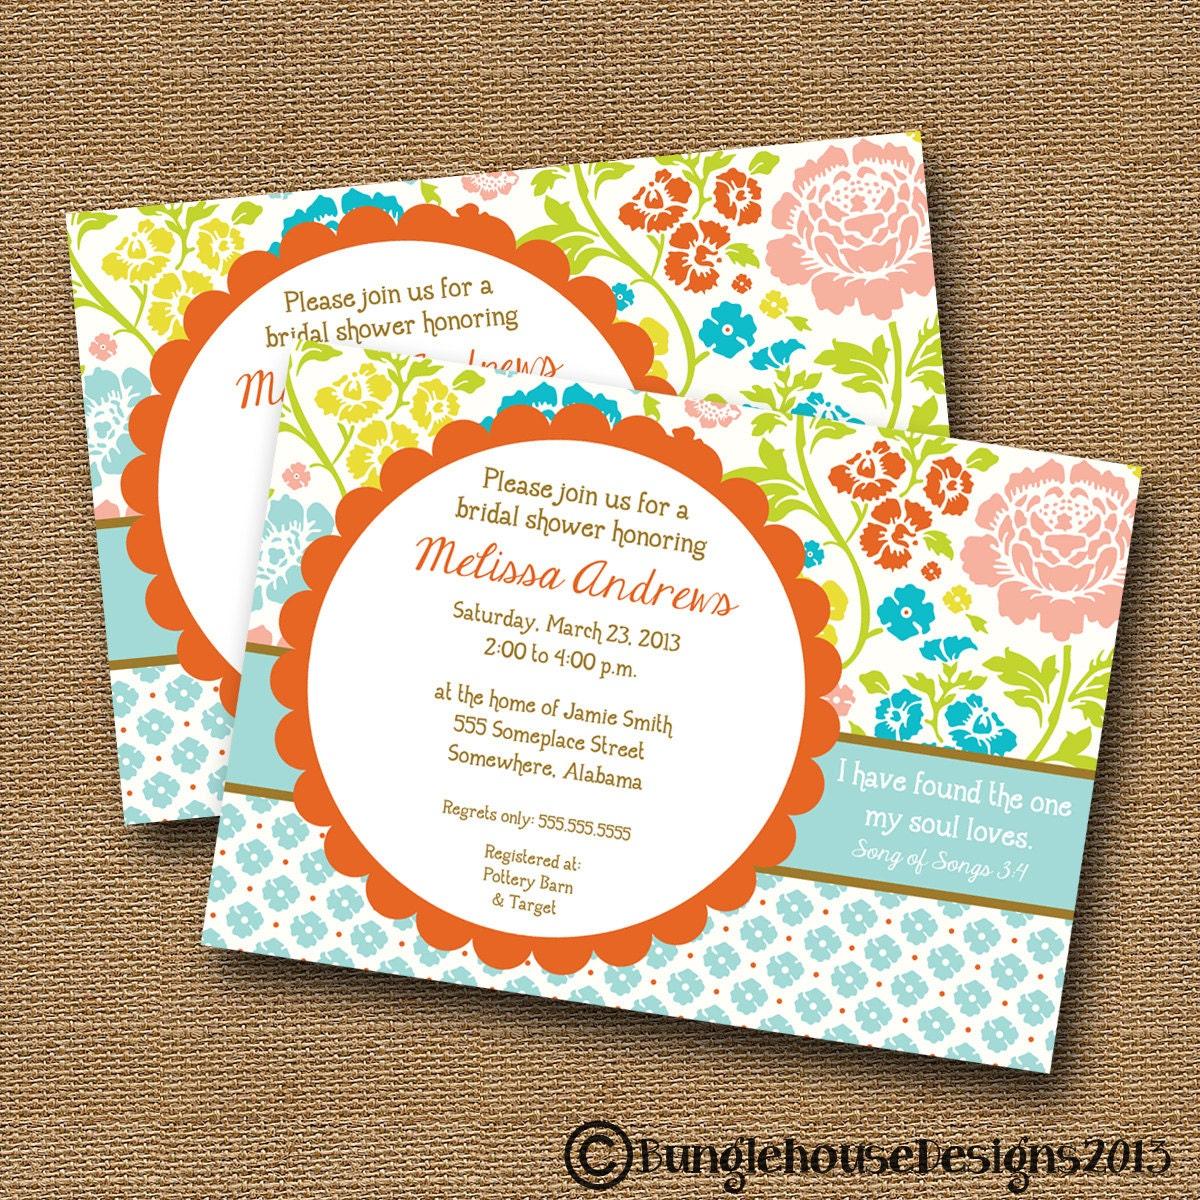 Bridal Shower Wedding Invitation DIY PRINTABLE Bright – Bible Verses for Wedding Invitation Cards